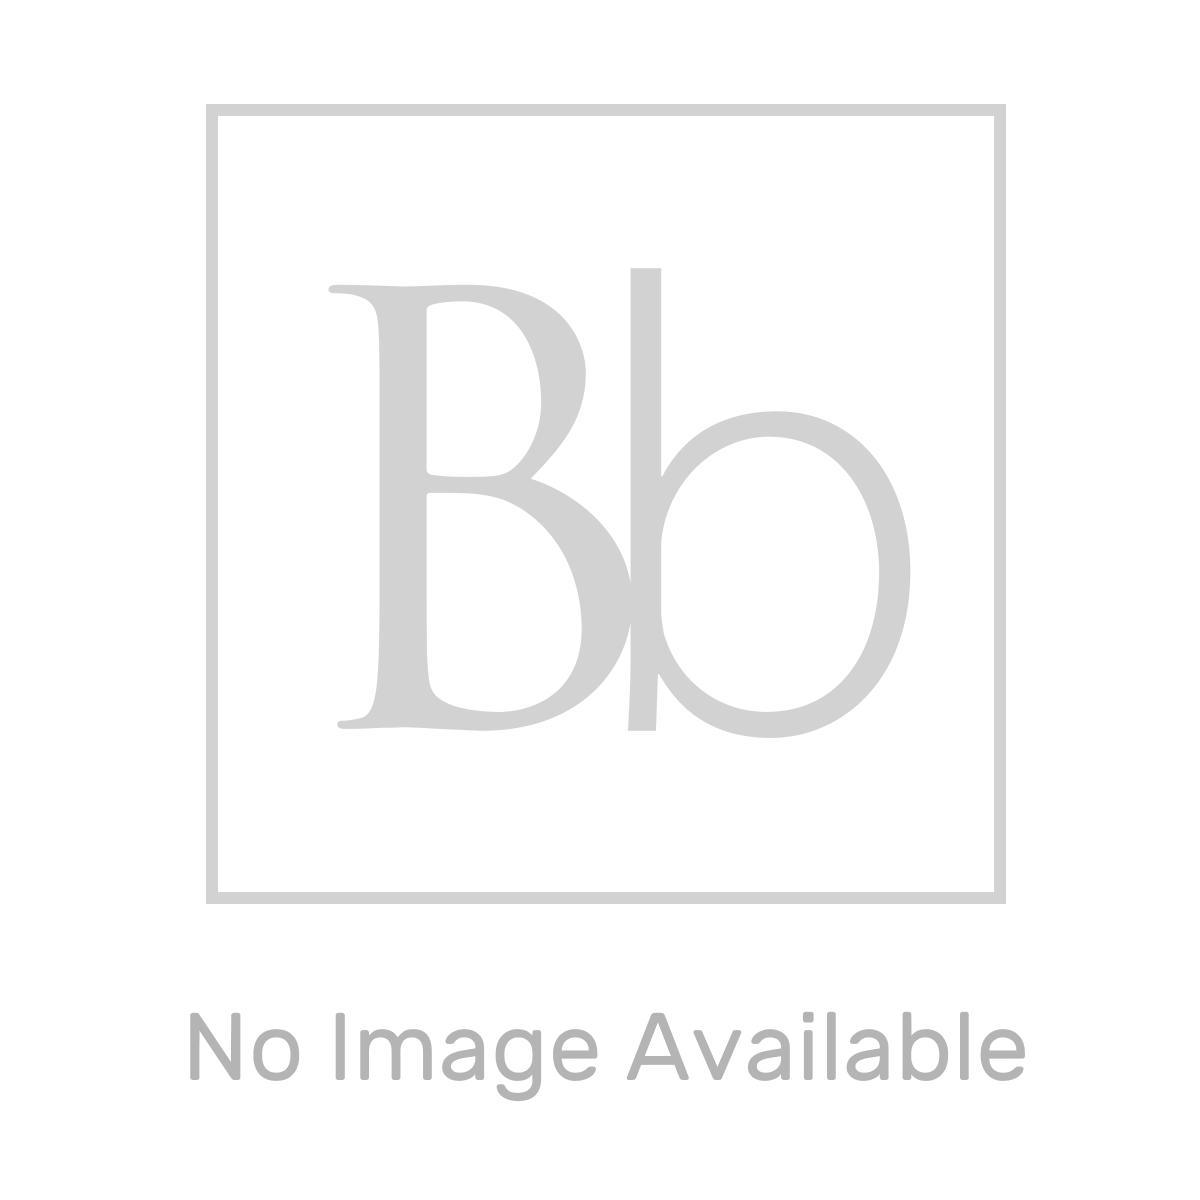 Aquadart White Slate Shower Tray 1600 x 700 Lifestyle